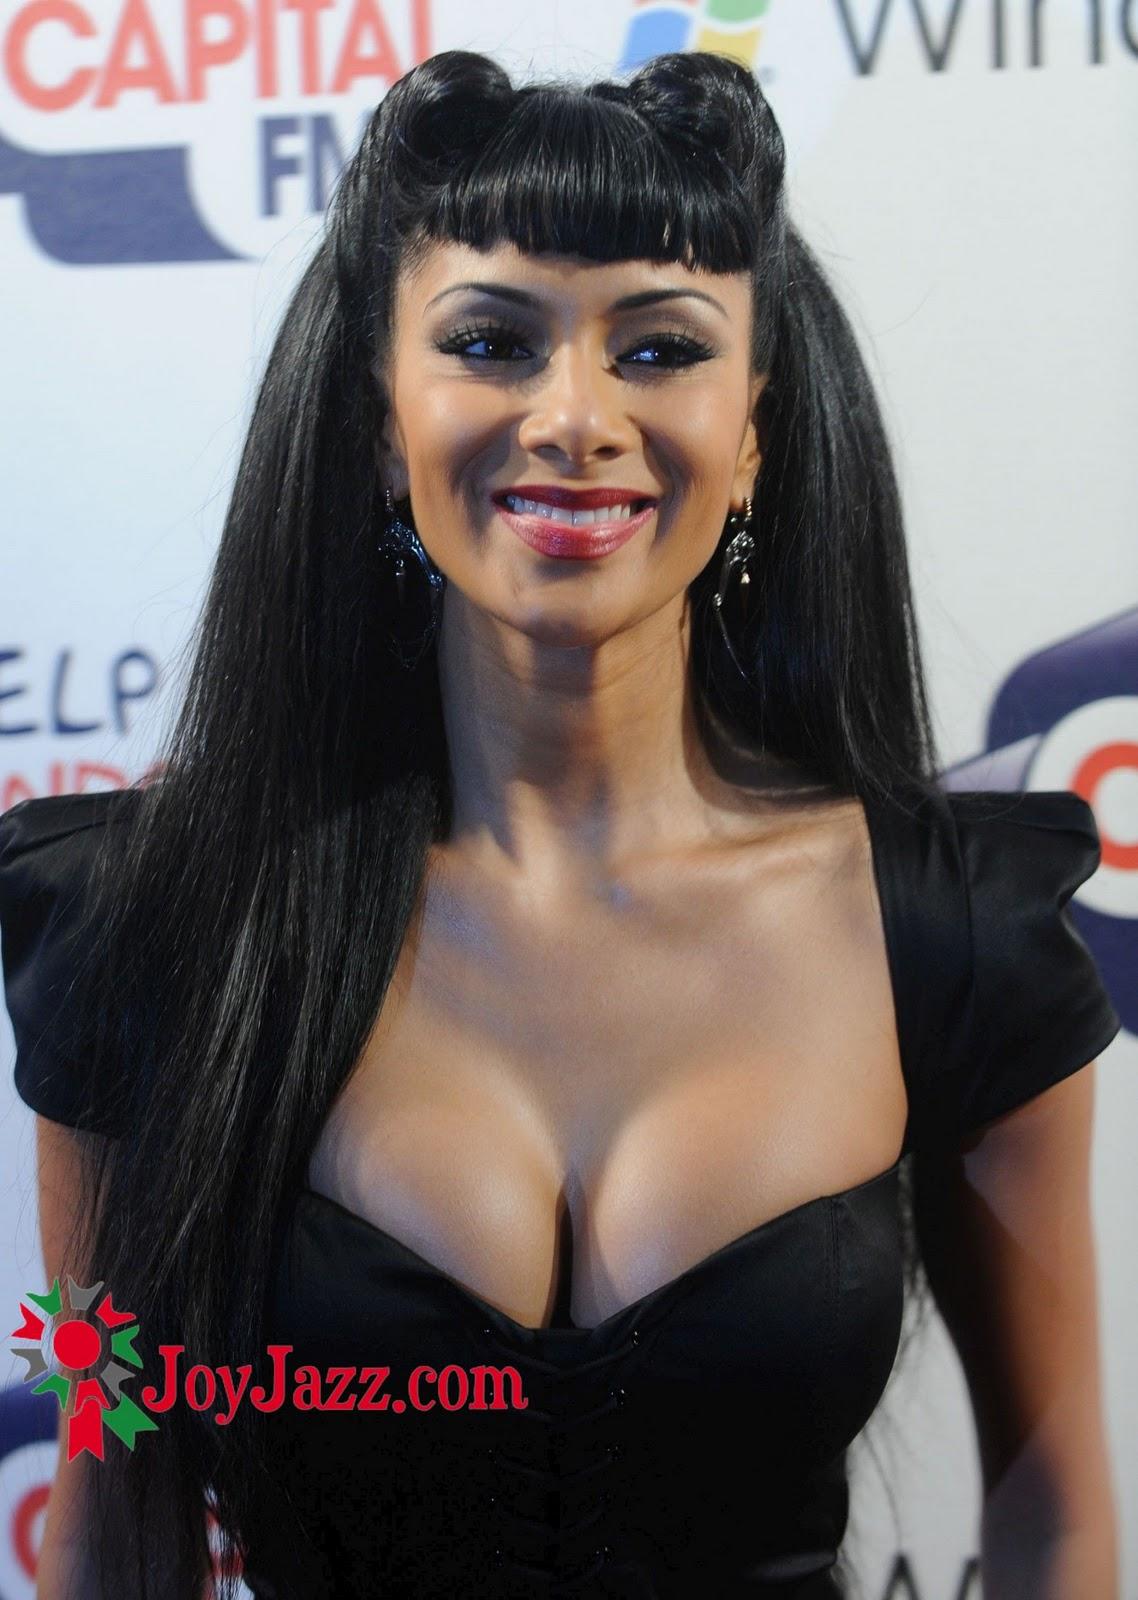 http://4.bp.blogspot.com/_0LdSrYkvVVk/TP_VRLAG-6I/AAAAAAAABPU/91tFG32ZH1s/s1600/Nicole-Scherzinger-101.jpg